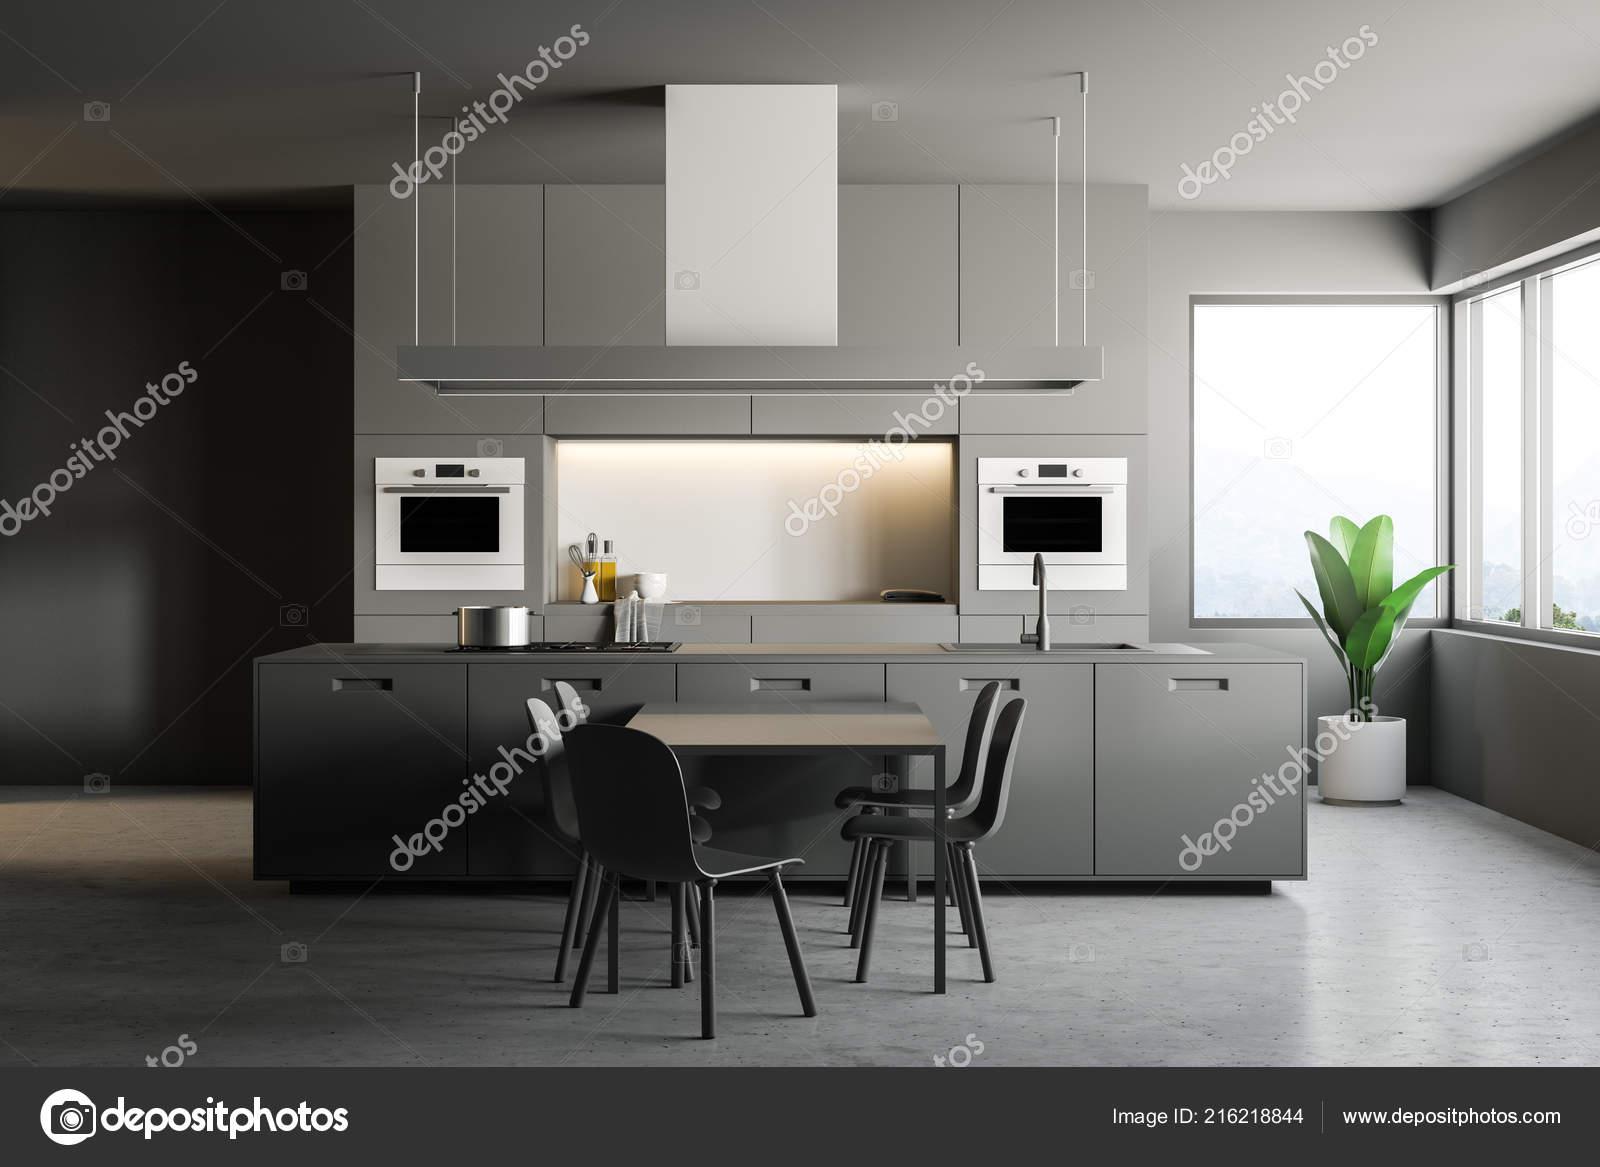 concrete kitchen table acrylic cabinets 室内的时尚厨房与灰色的墙壁混凝土地板灰色台面与建筑在家电一个岛屿和 室内的时尚厨房与灰色的墙壁 混凝土地板 灰色台面与建筑在家电 一个岛屿和一个灰色的桌子与椅子 3d 渲染复制空间 照片作者denisismagilov